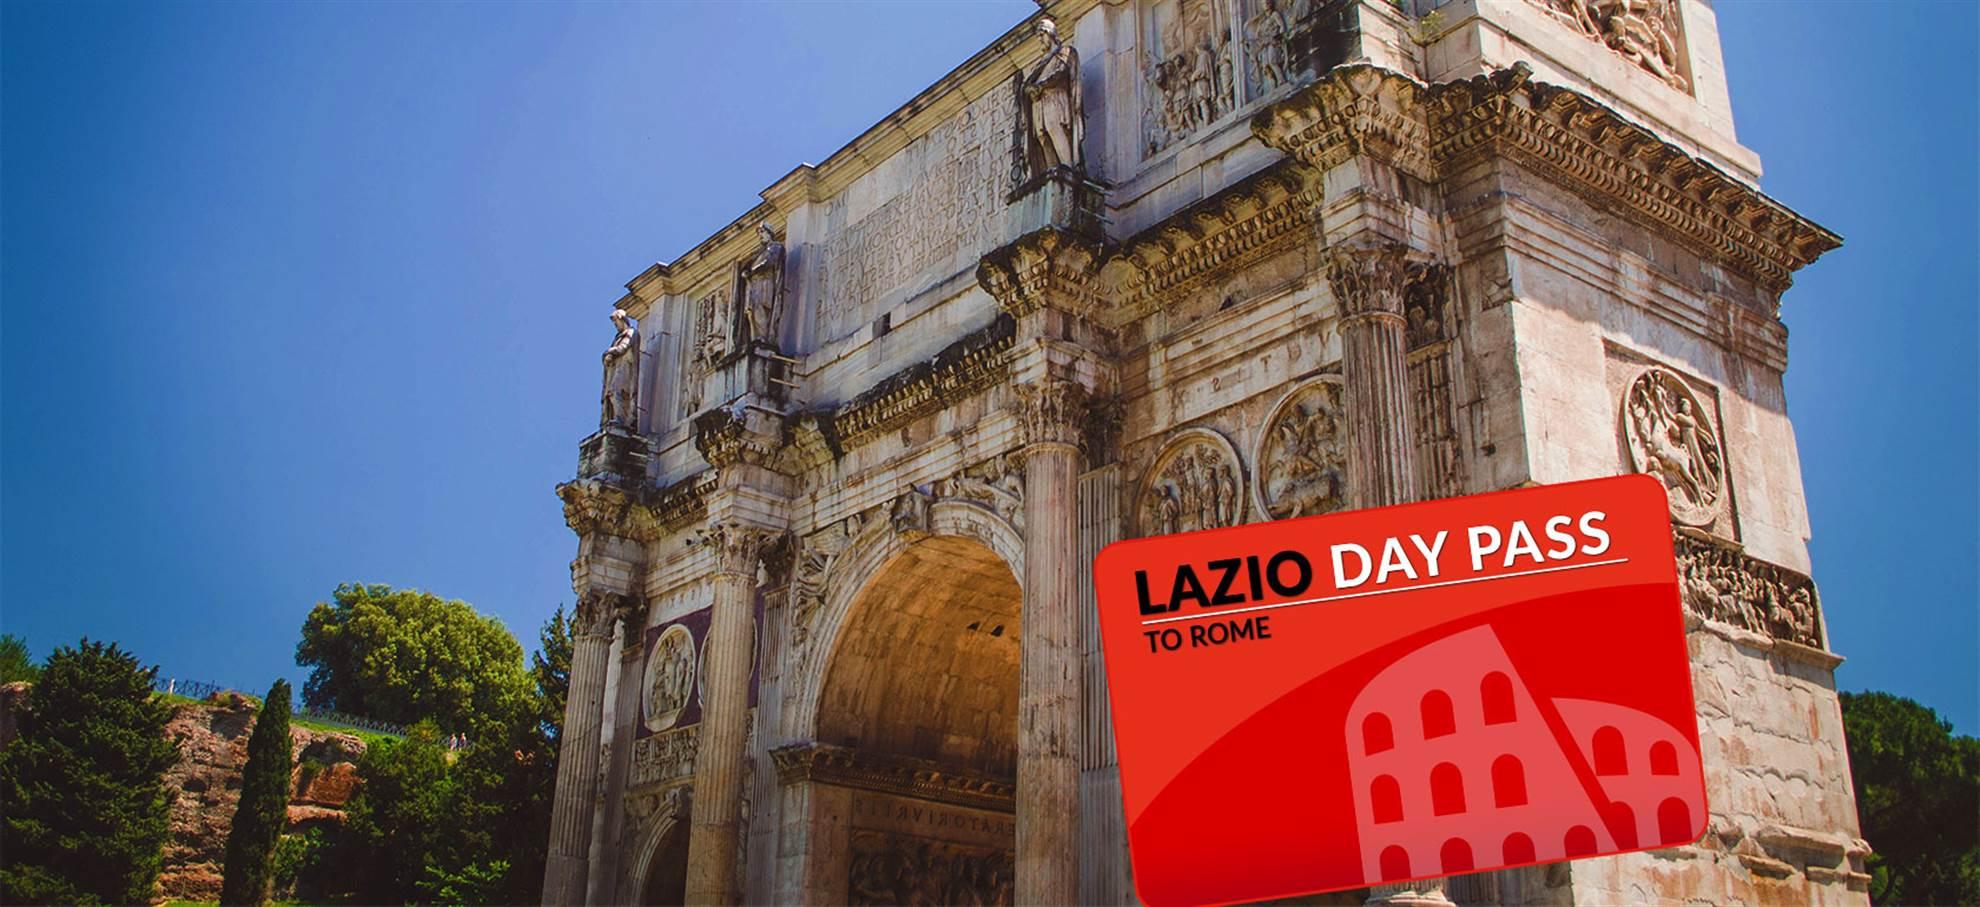 Lazio naar Rome Dagpas